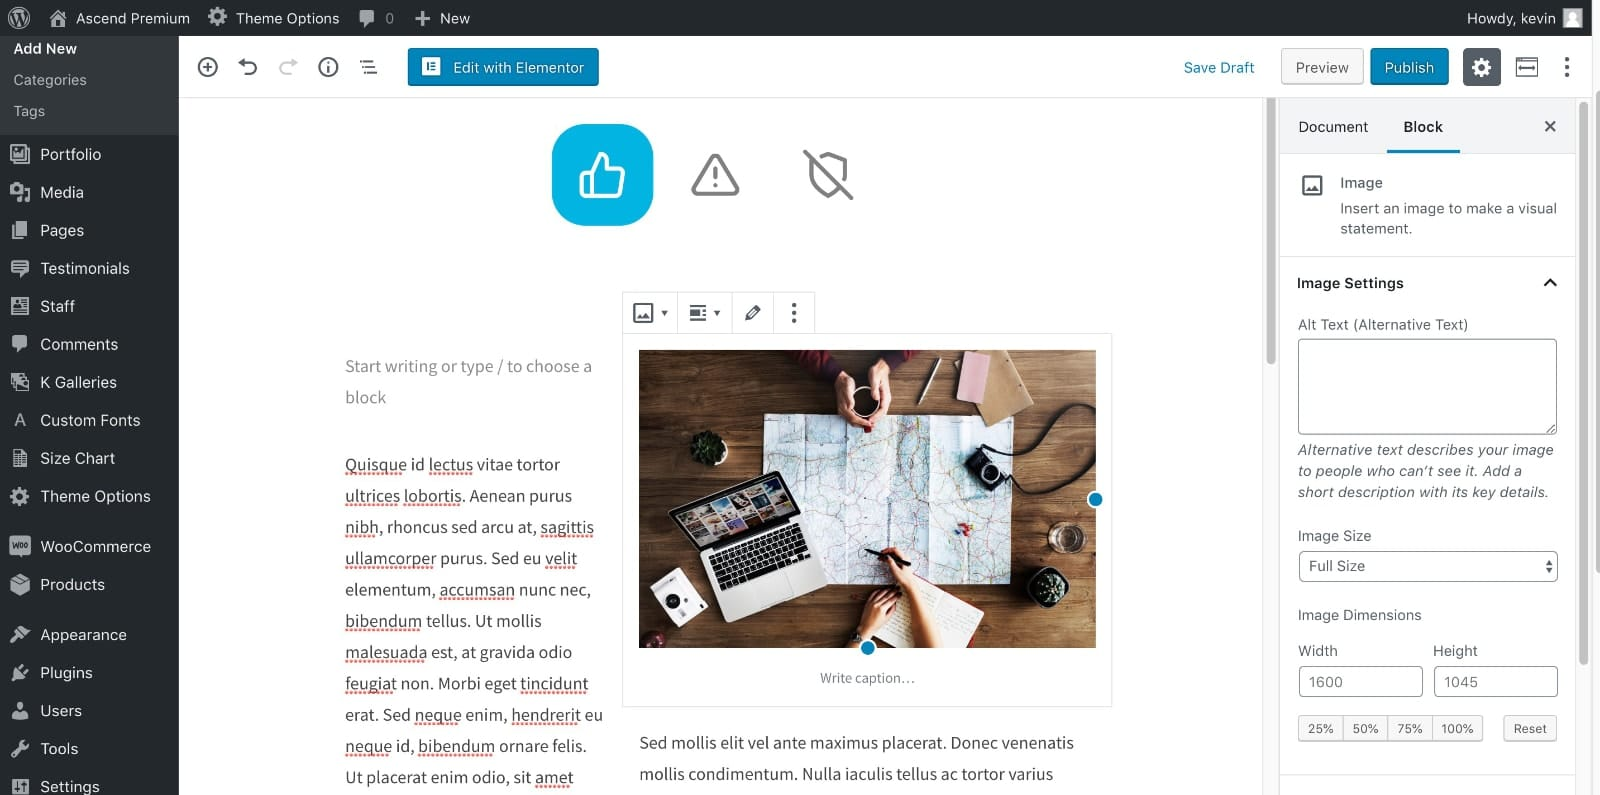 Customize Page Layout